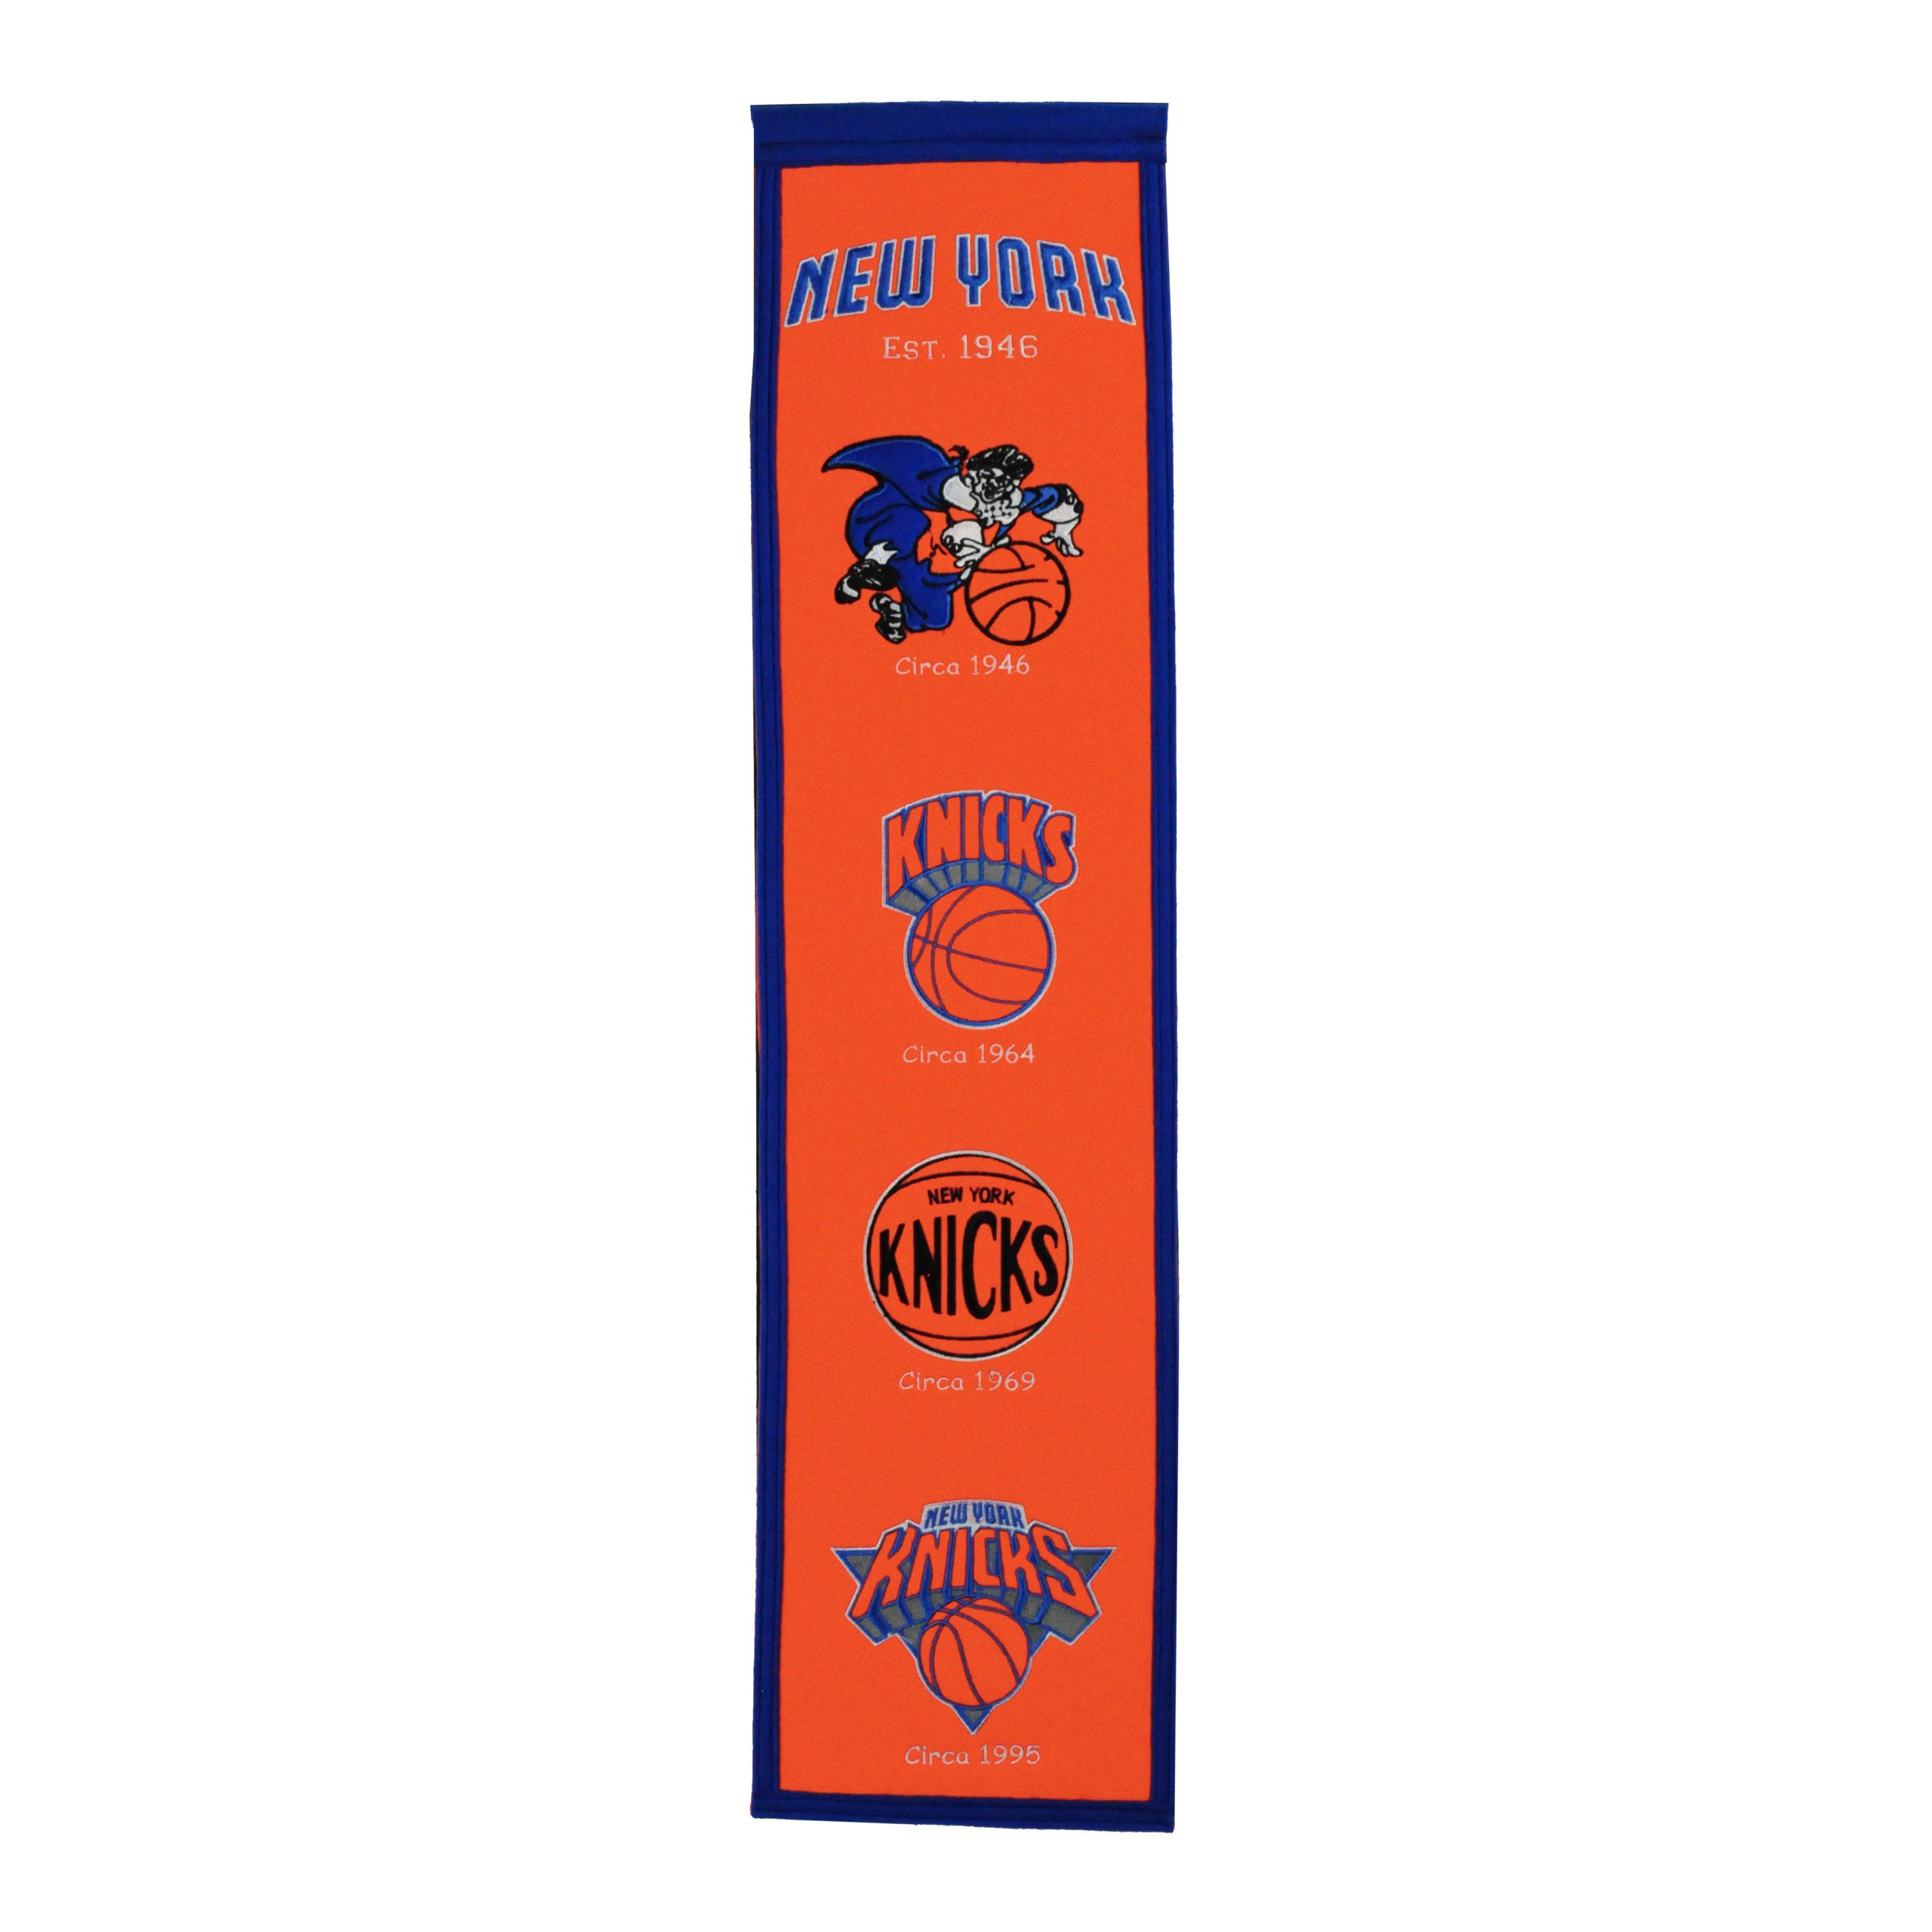 "New York Knicks 8"" x 32"" Premium Heritage Banner"